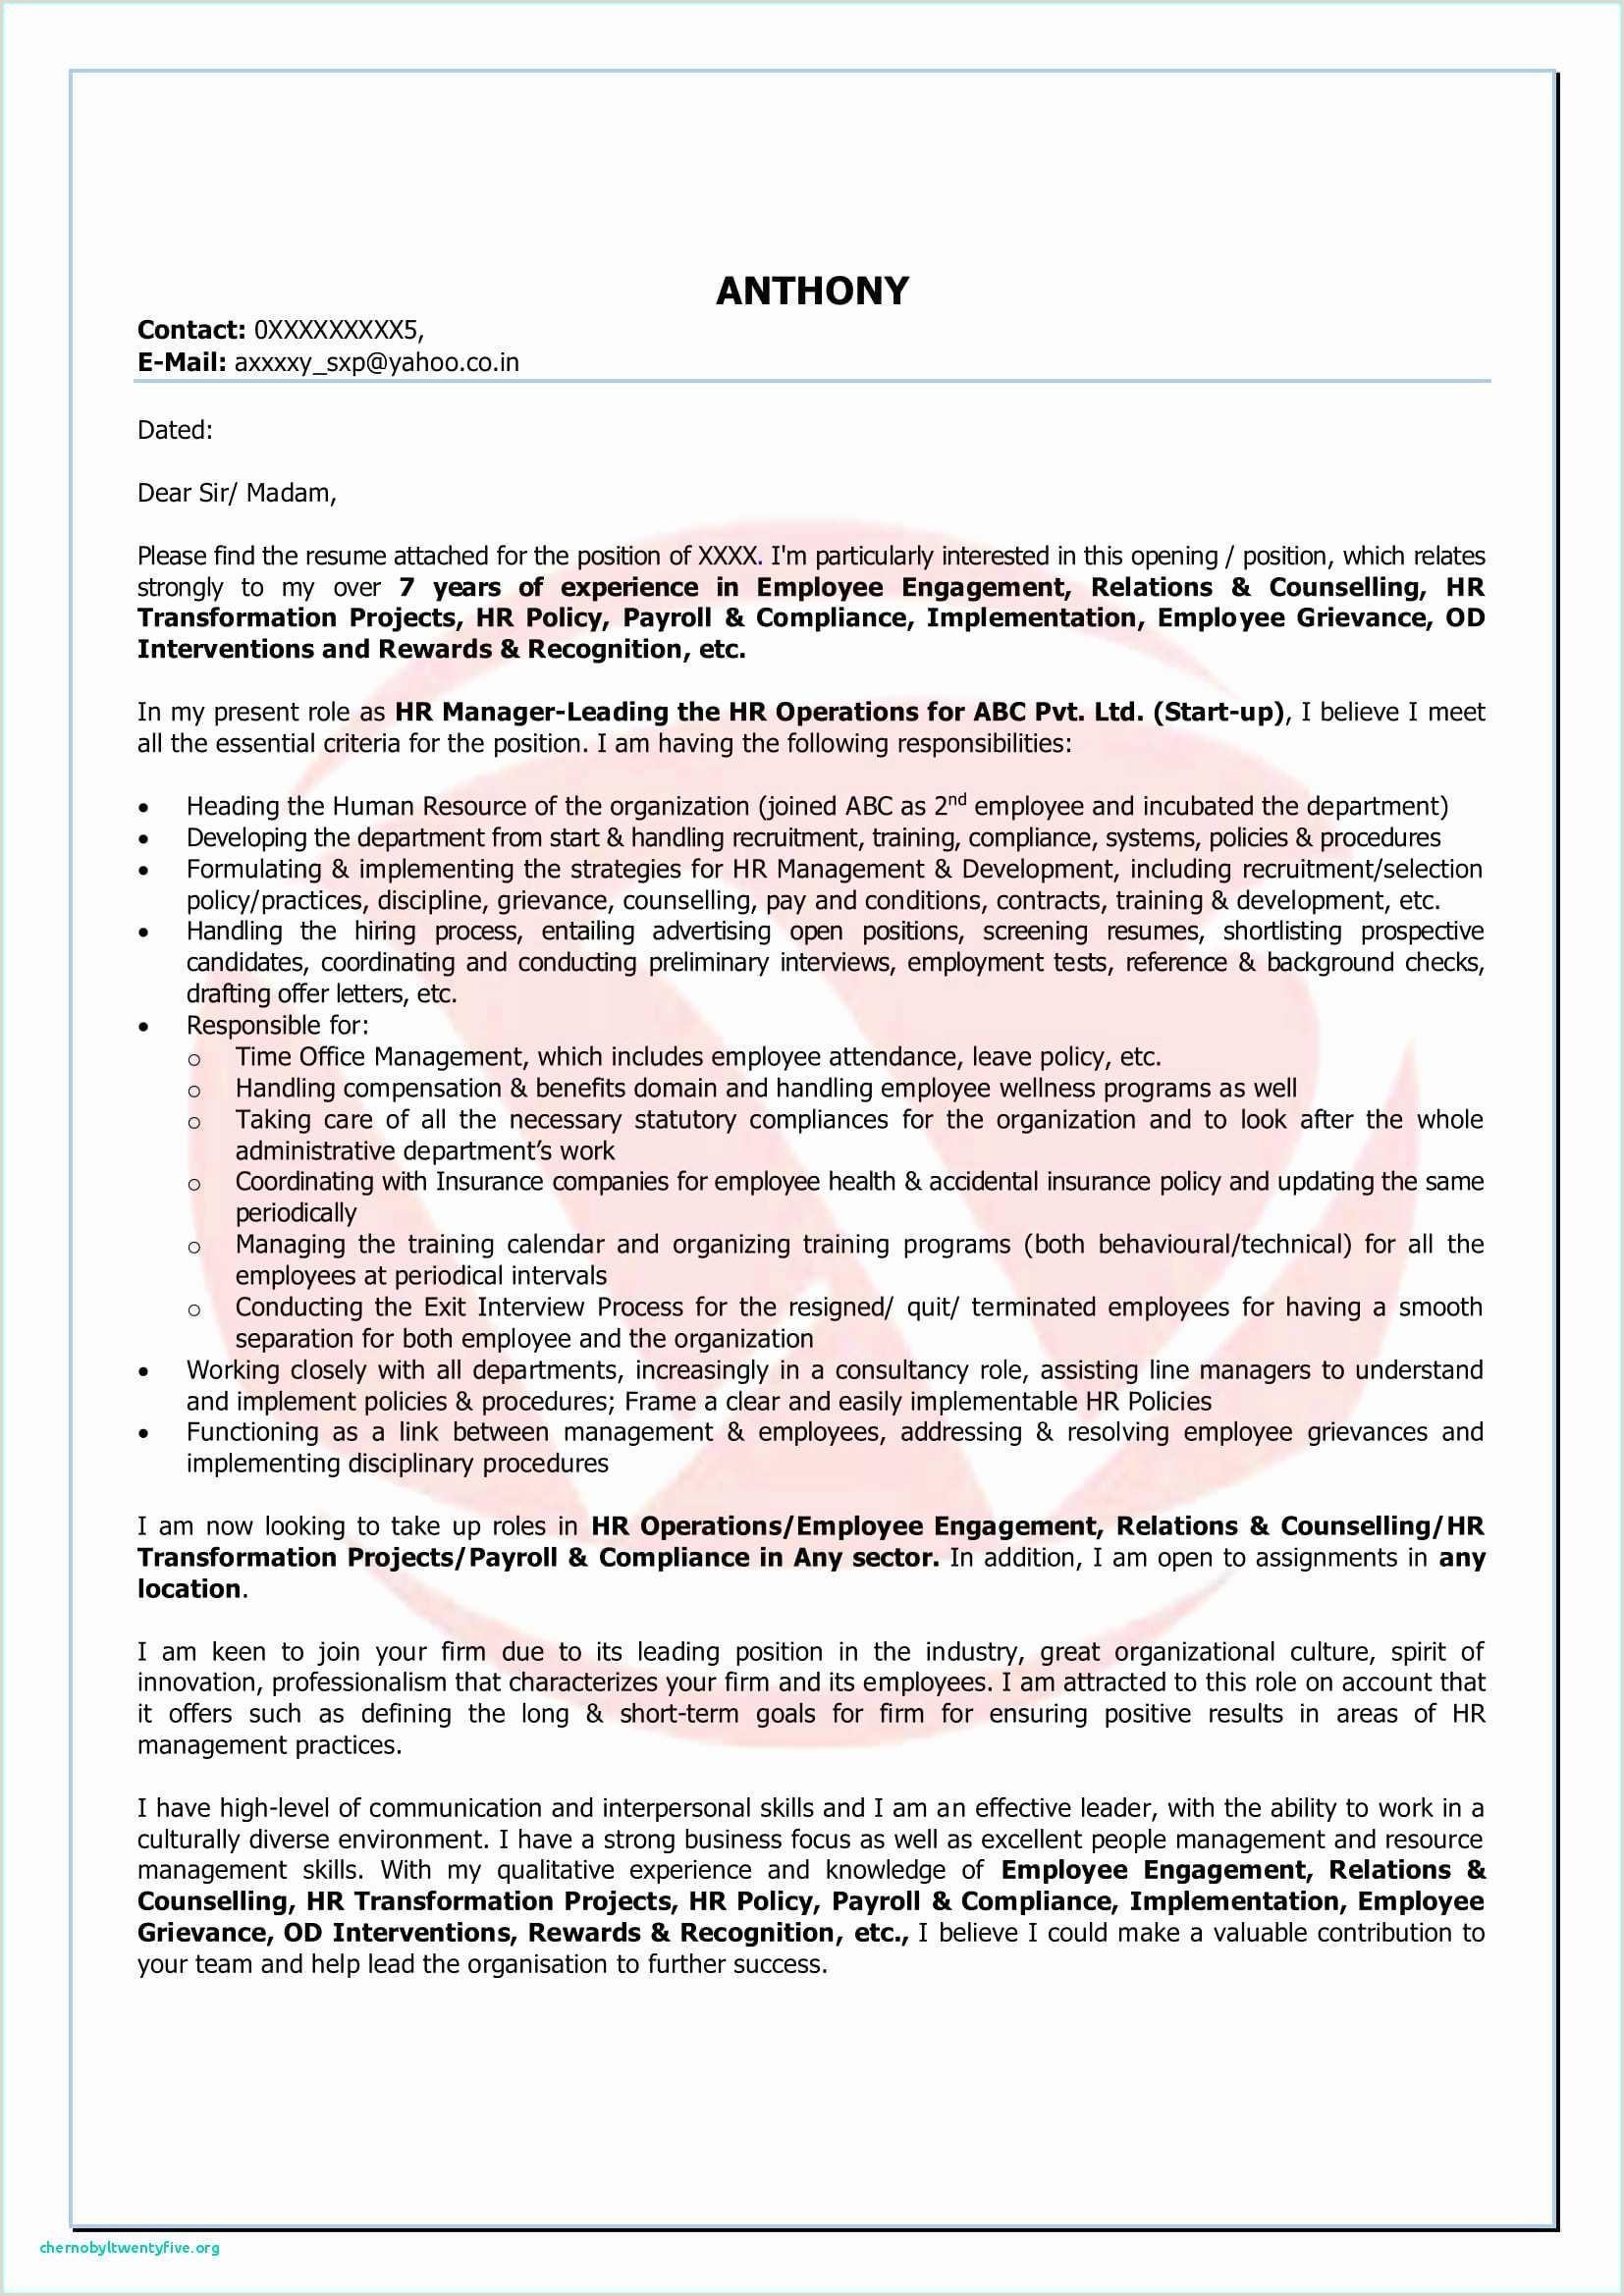 9 10 job reinstatement letter sample